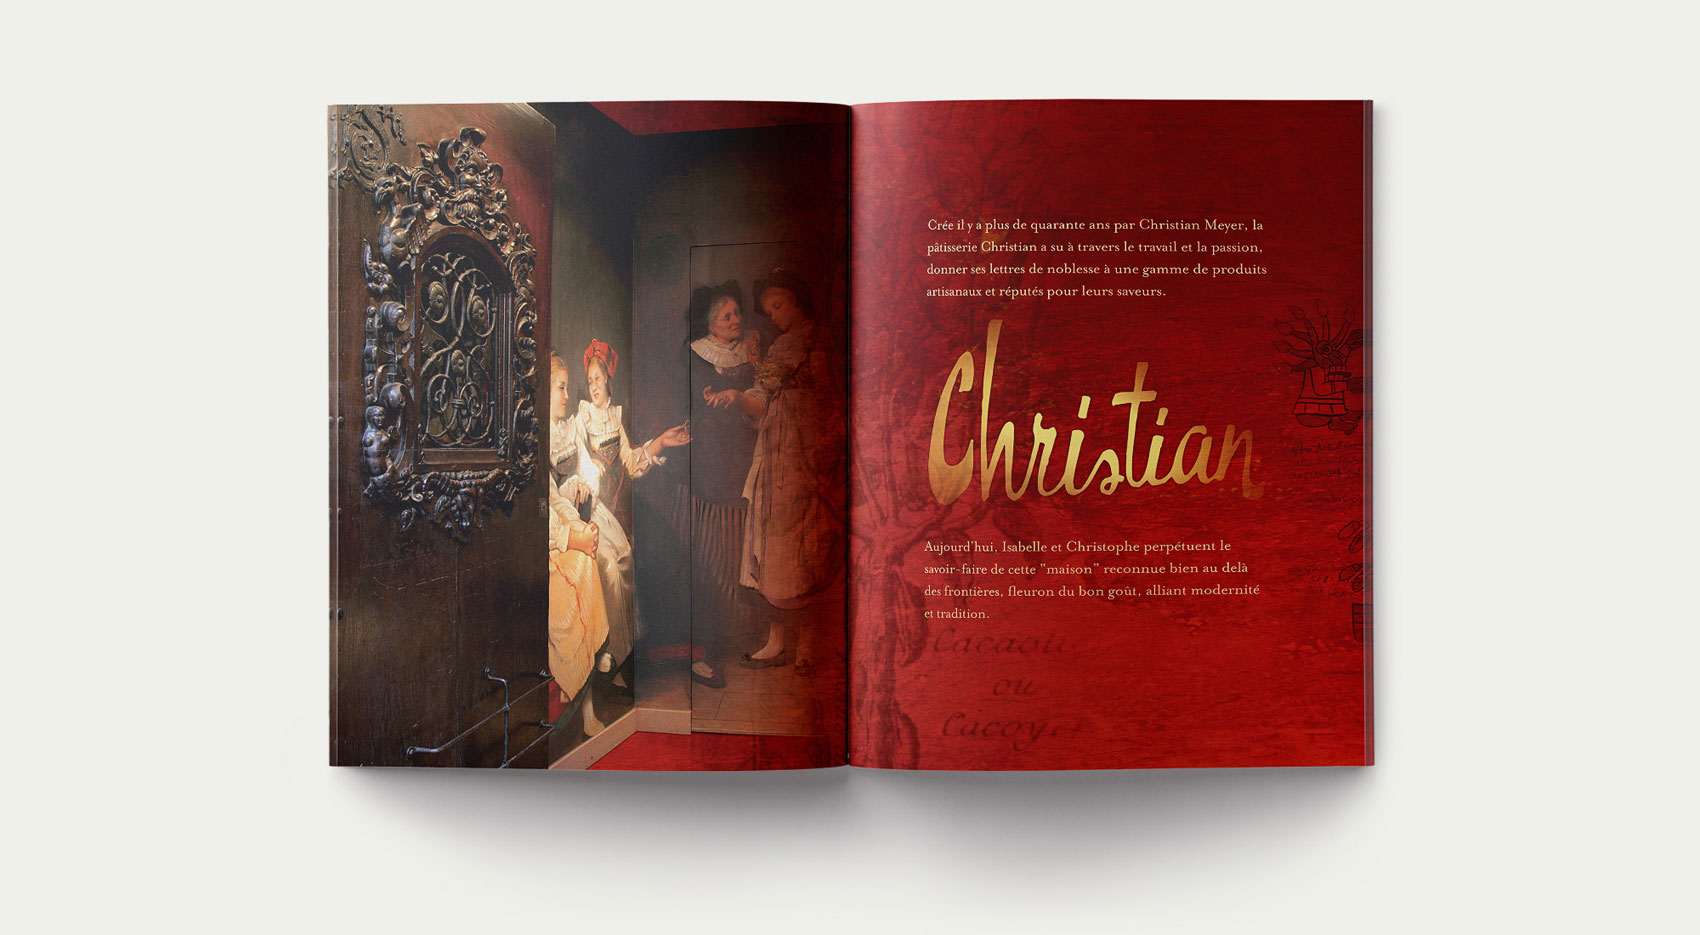 brochure-christian-2